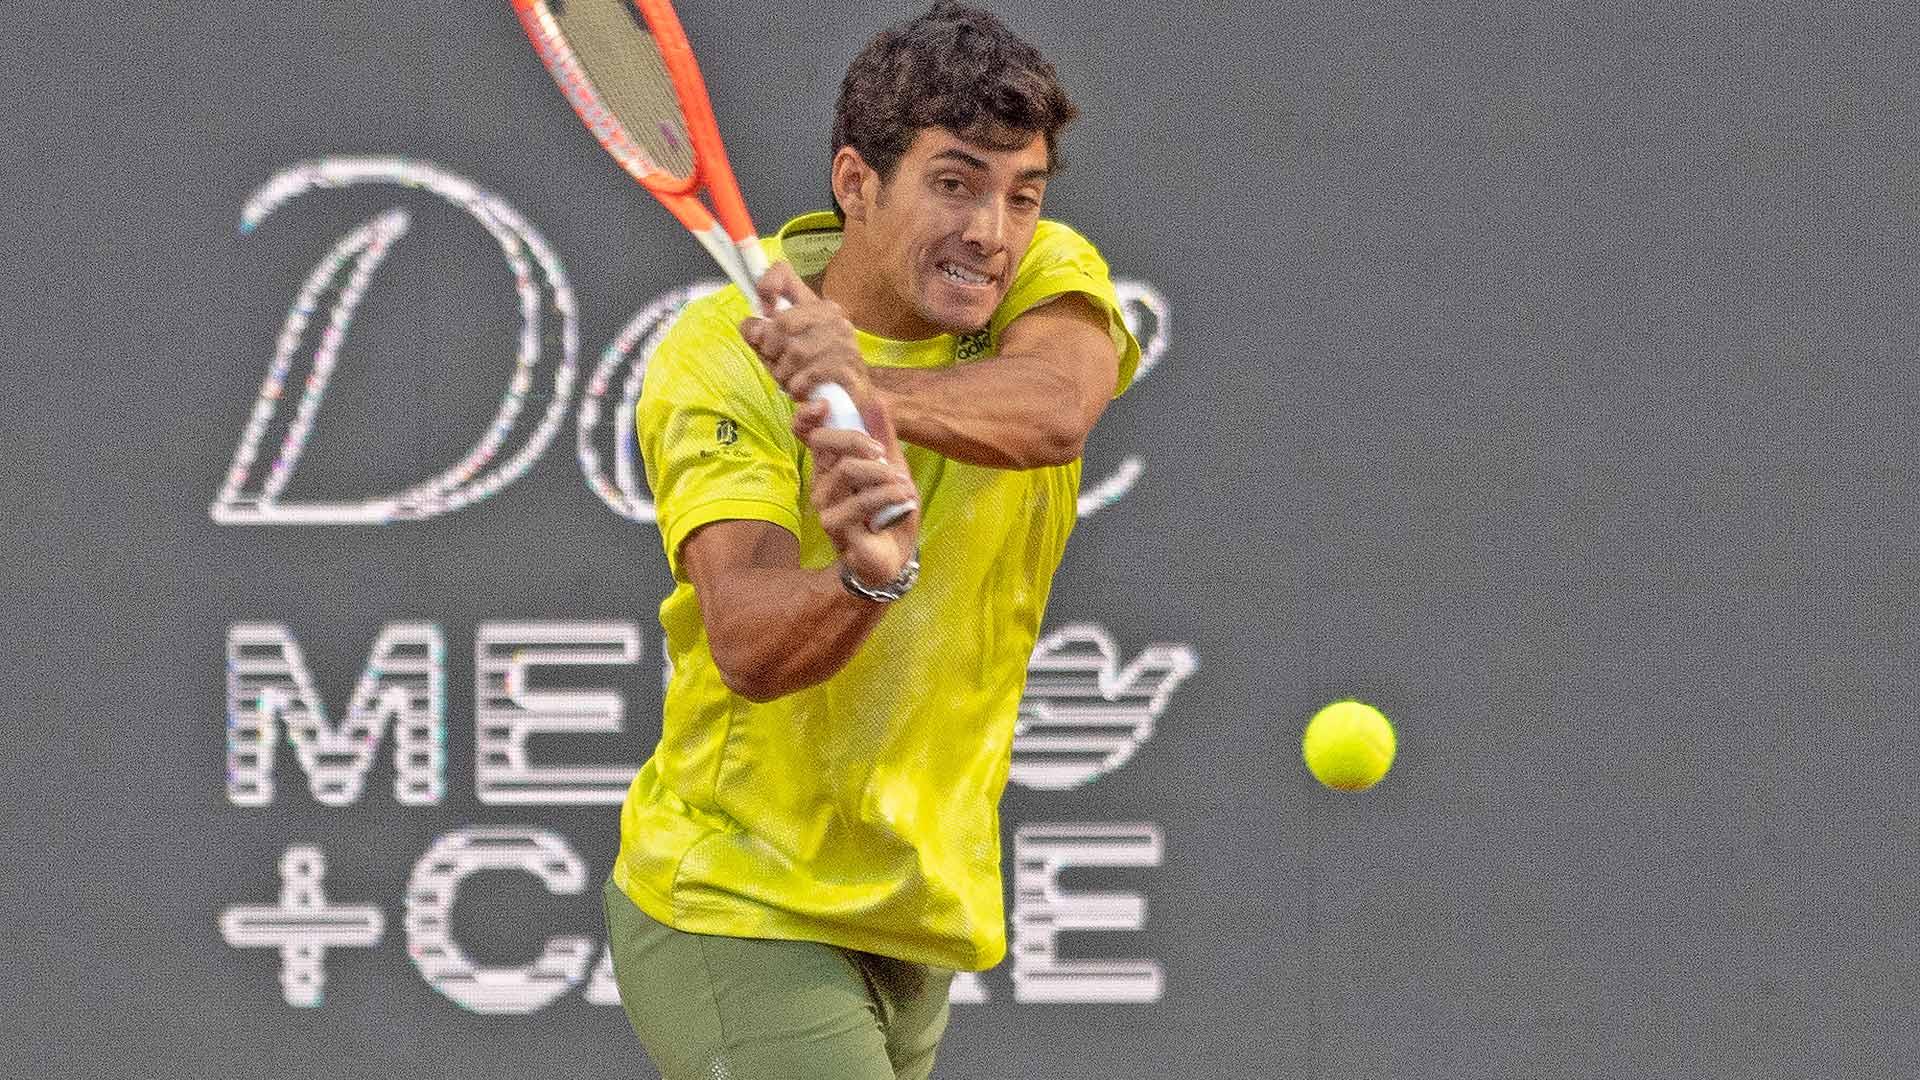 Santiago Native Cristian Garin Bests Facundo Bagnis To Win Home Title Atp Tour Tennis